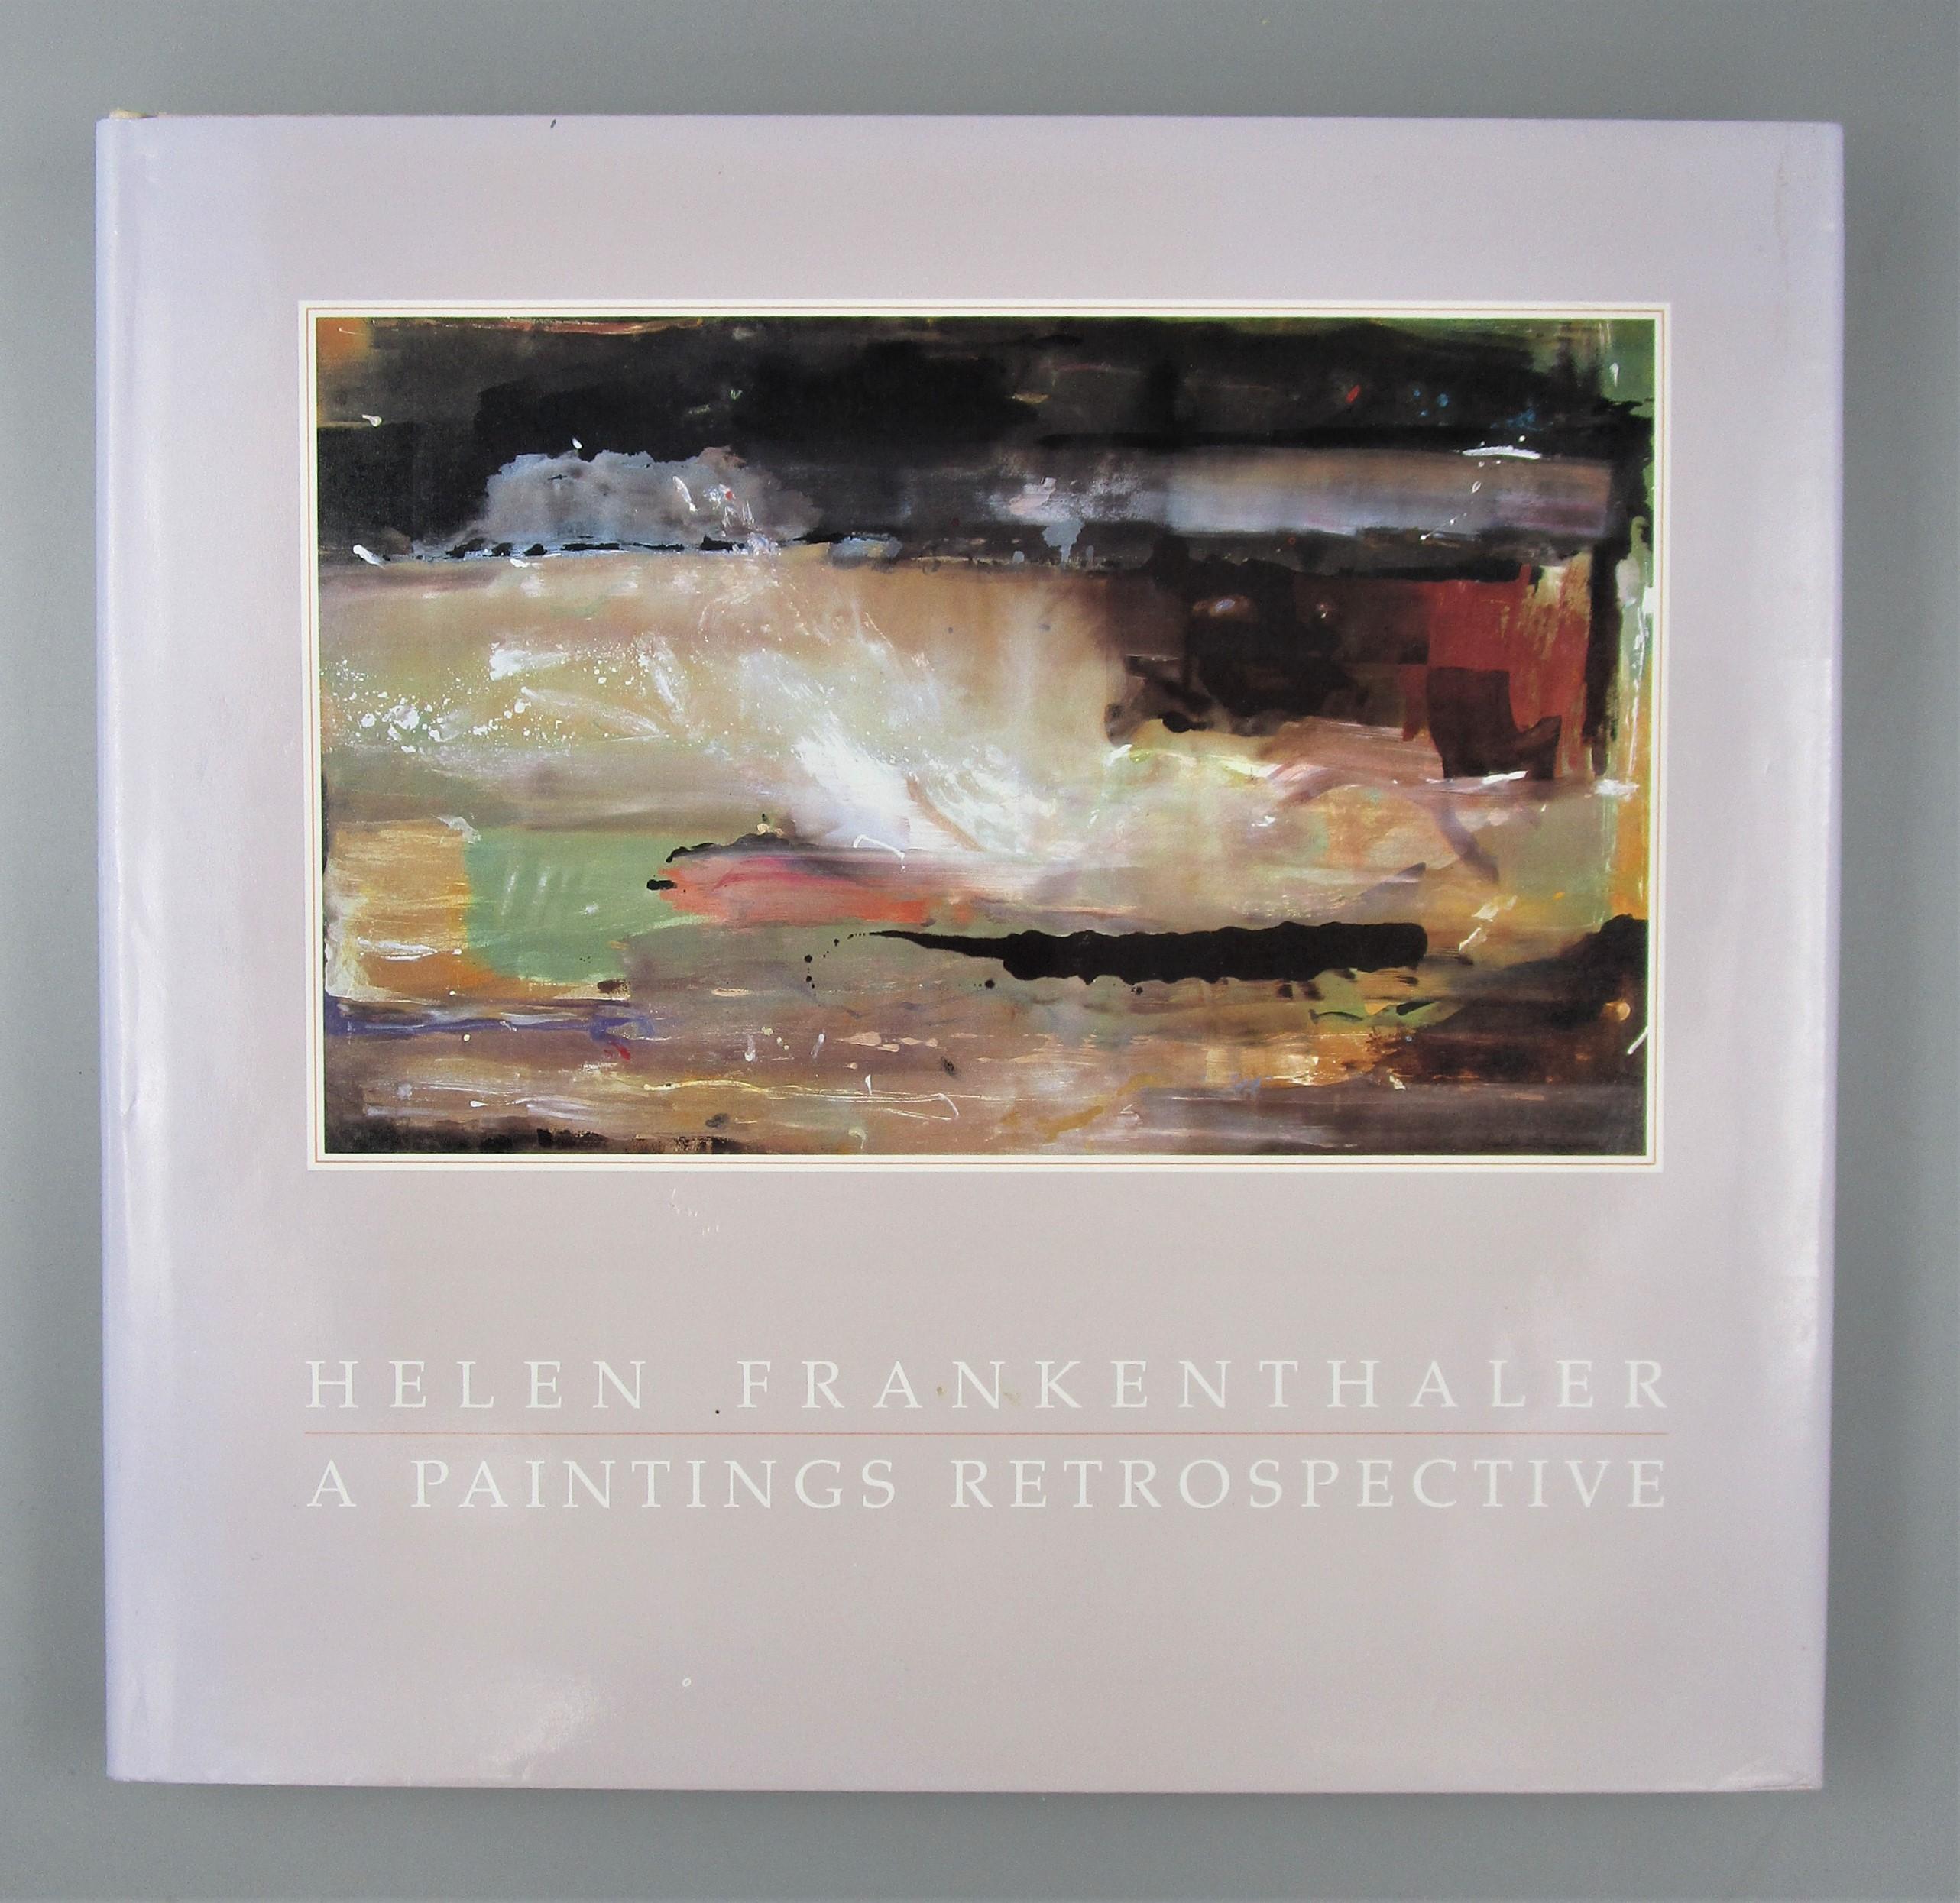 HELEN FRANKENTHALER: A PAINTINGS RETROSPECTIVE, by E.A. Carmean Jr. - 1989